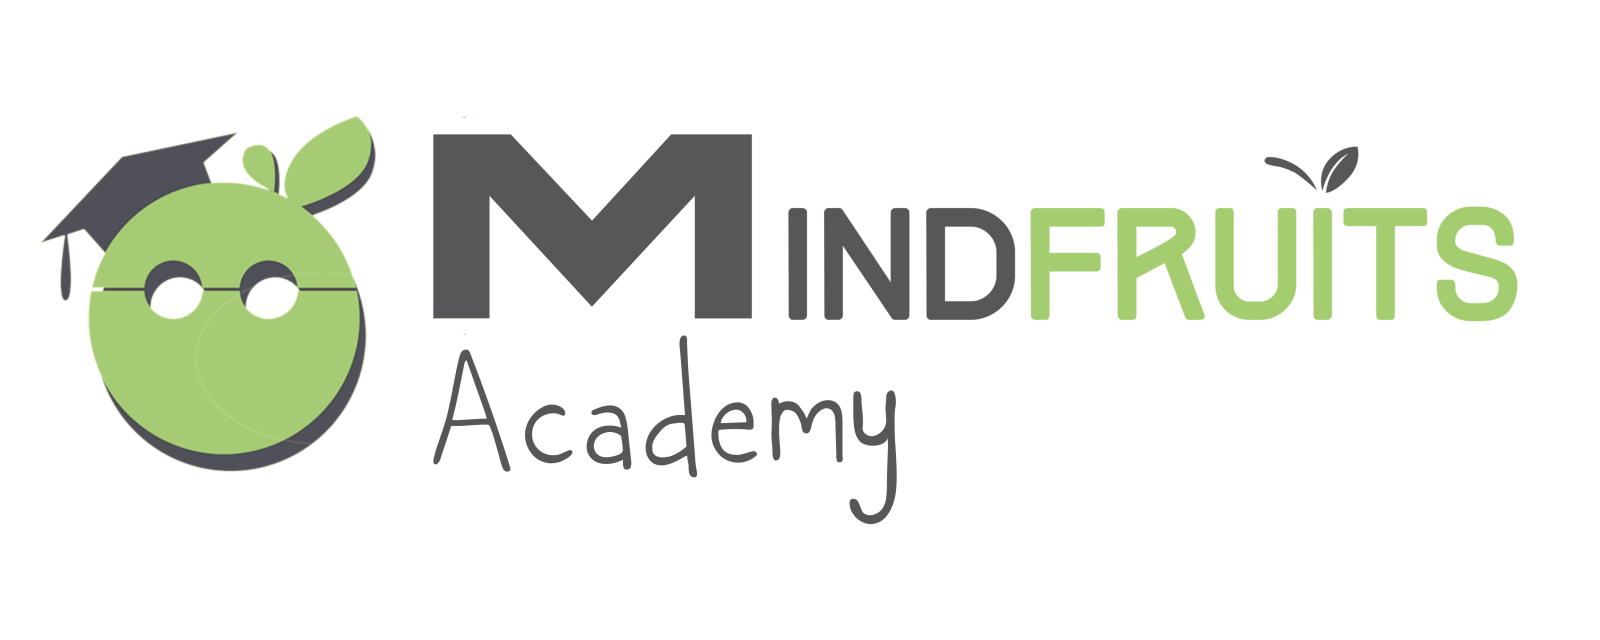 MindFruits Academy